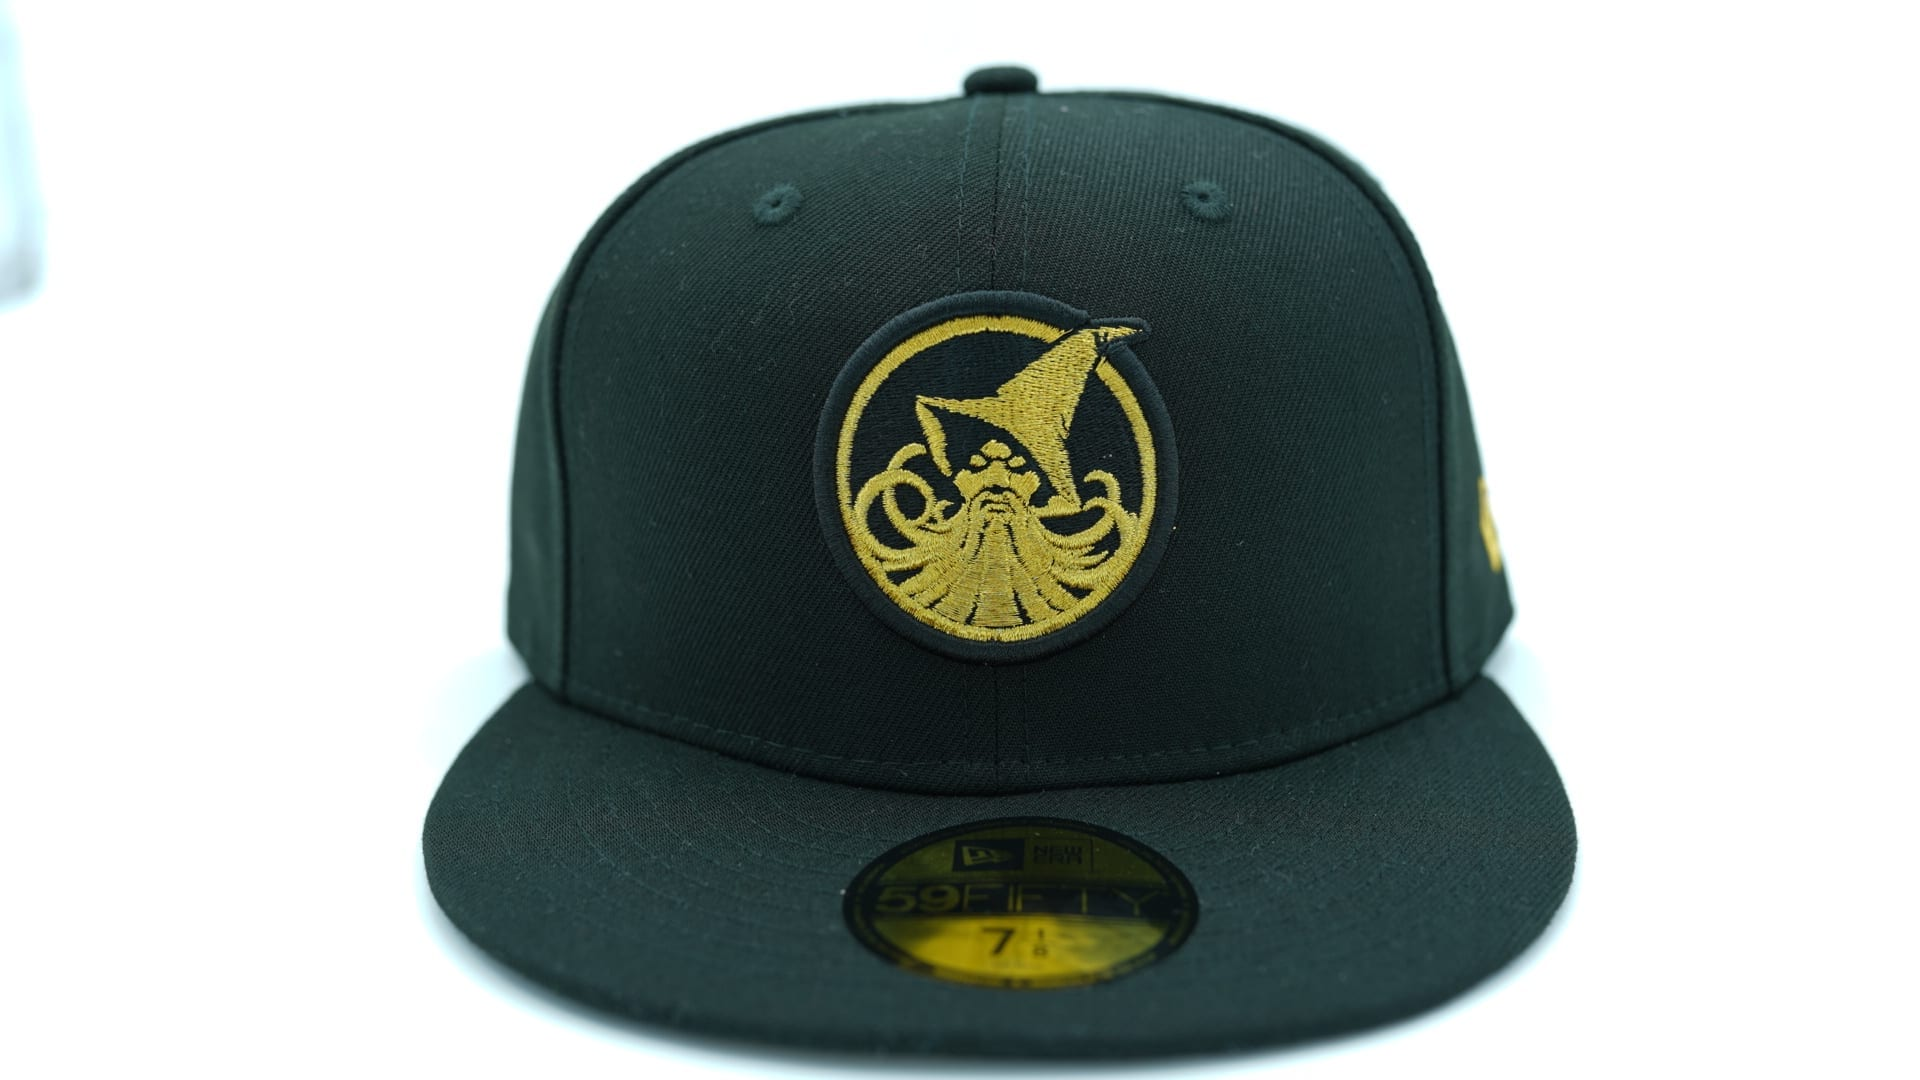 new york yankees 2009 world series pin 59fifty fitted baseball cap new era mlb